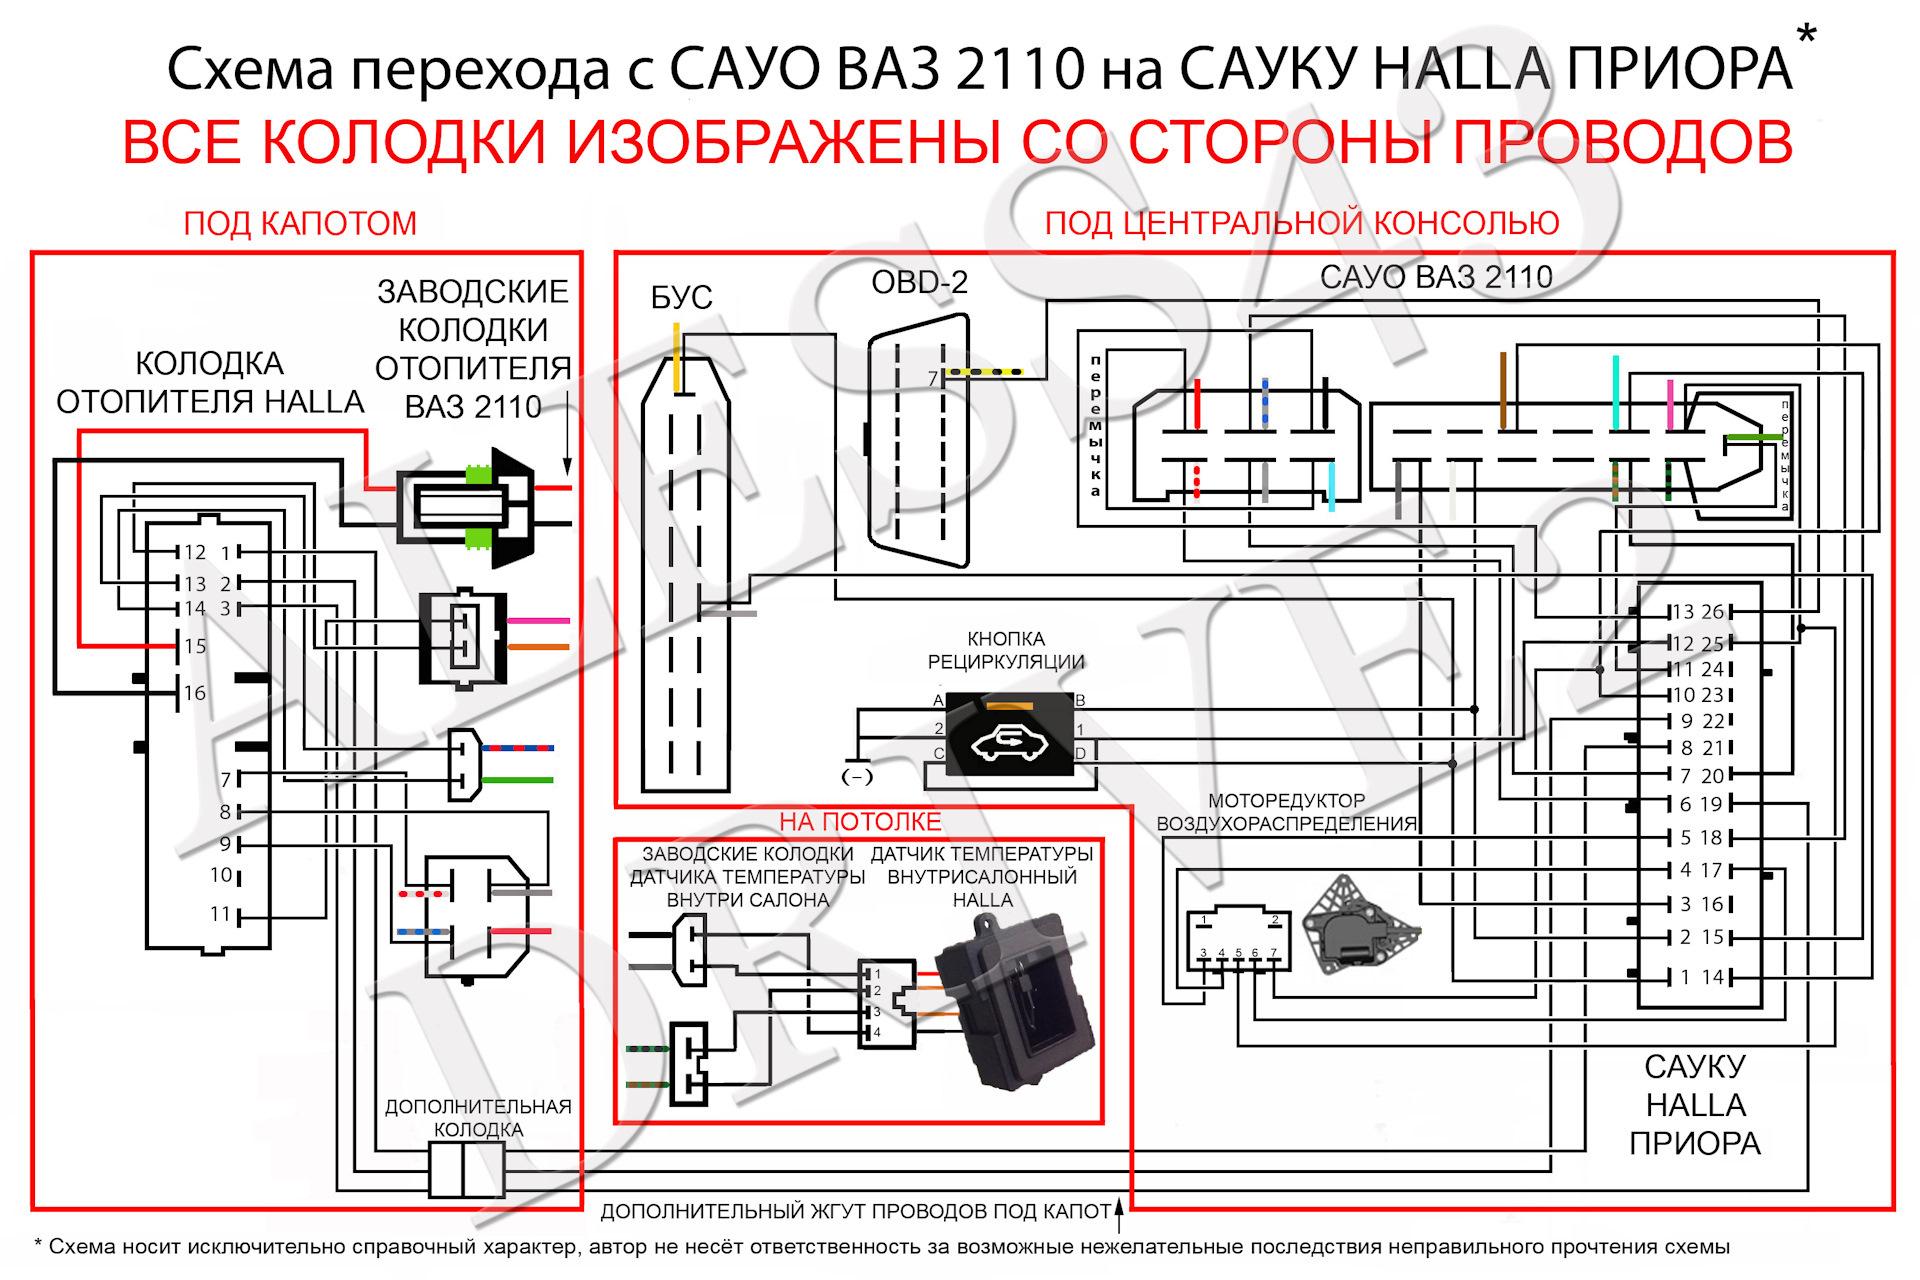 Приора схема установки противотуманок на